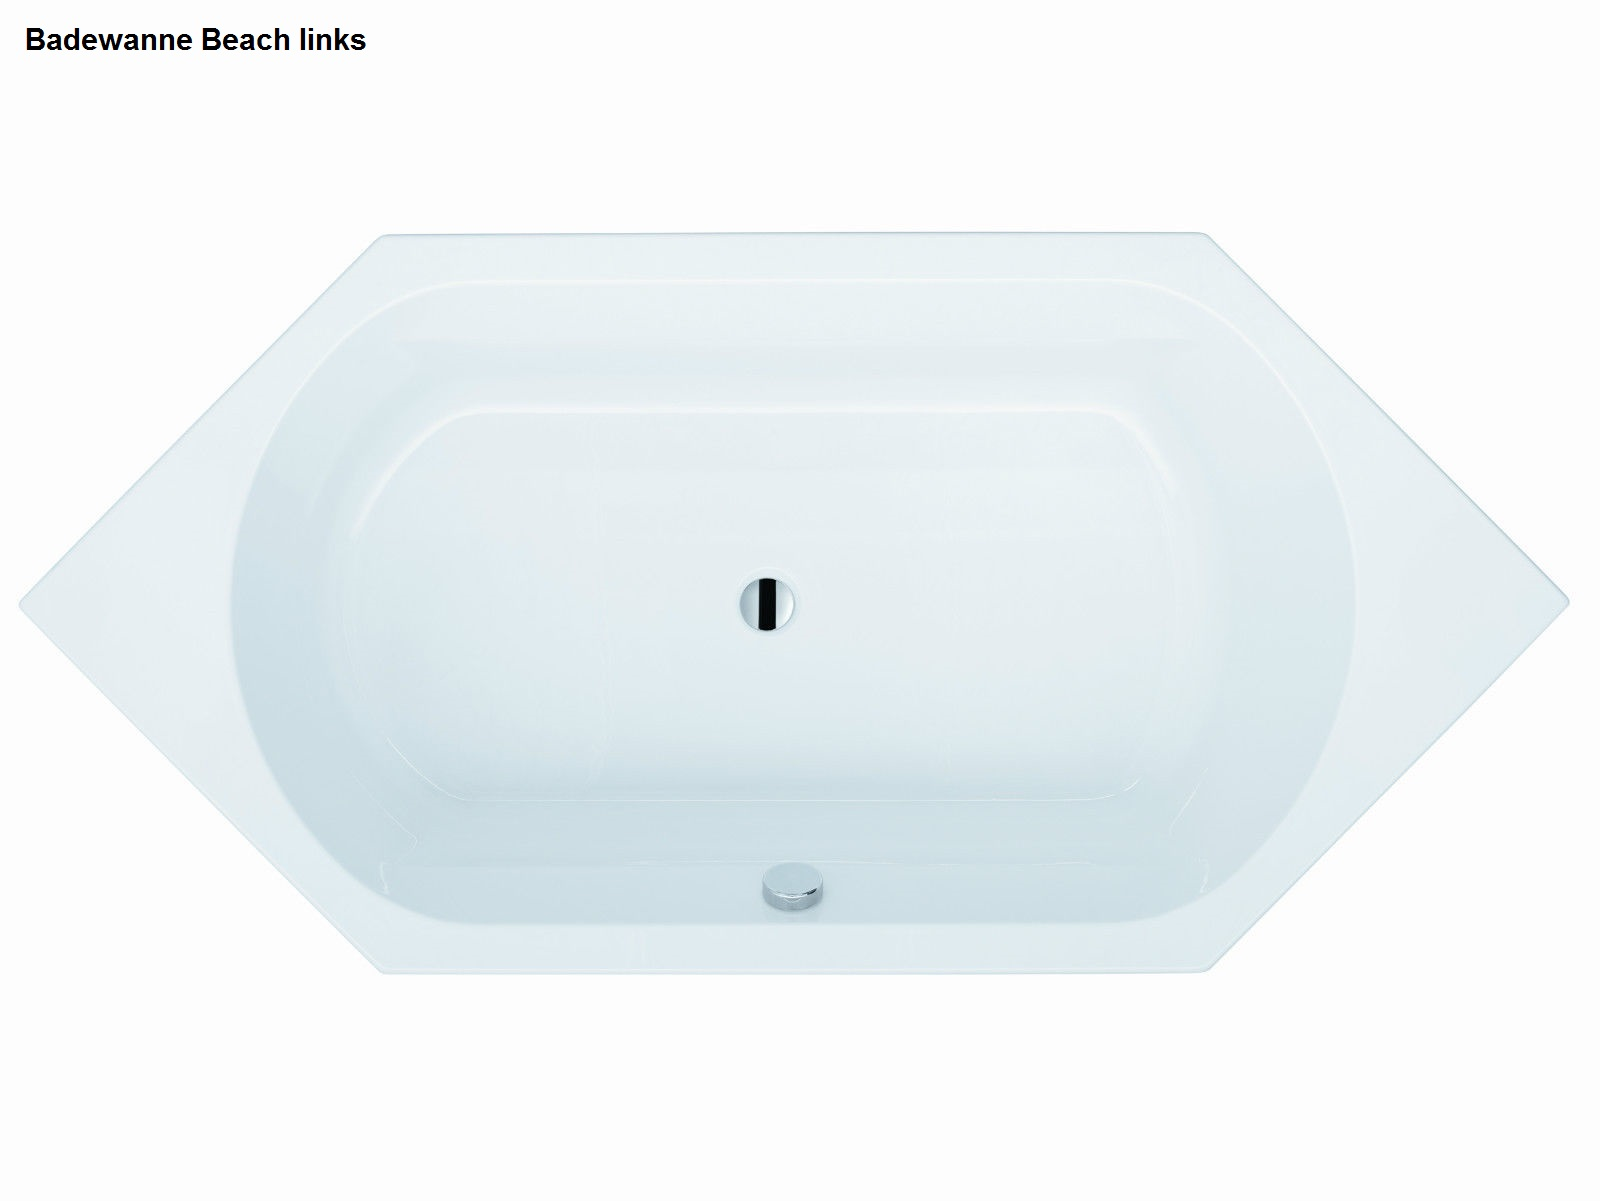 badewanne beach 6 eck 190 x 90 x 45 rechts o links aus deutscher fertigung ebay. Black Bedroom Furniture Sets. Home Design Ideas